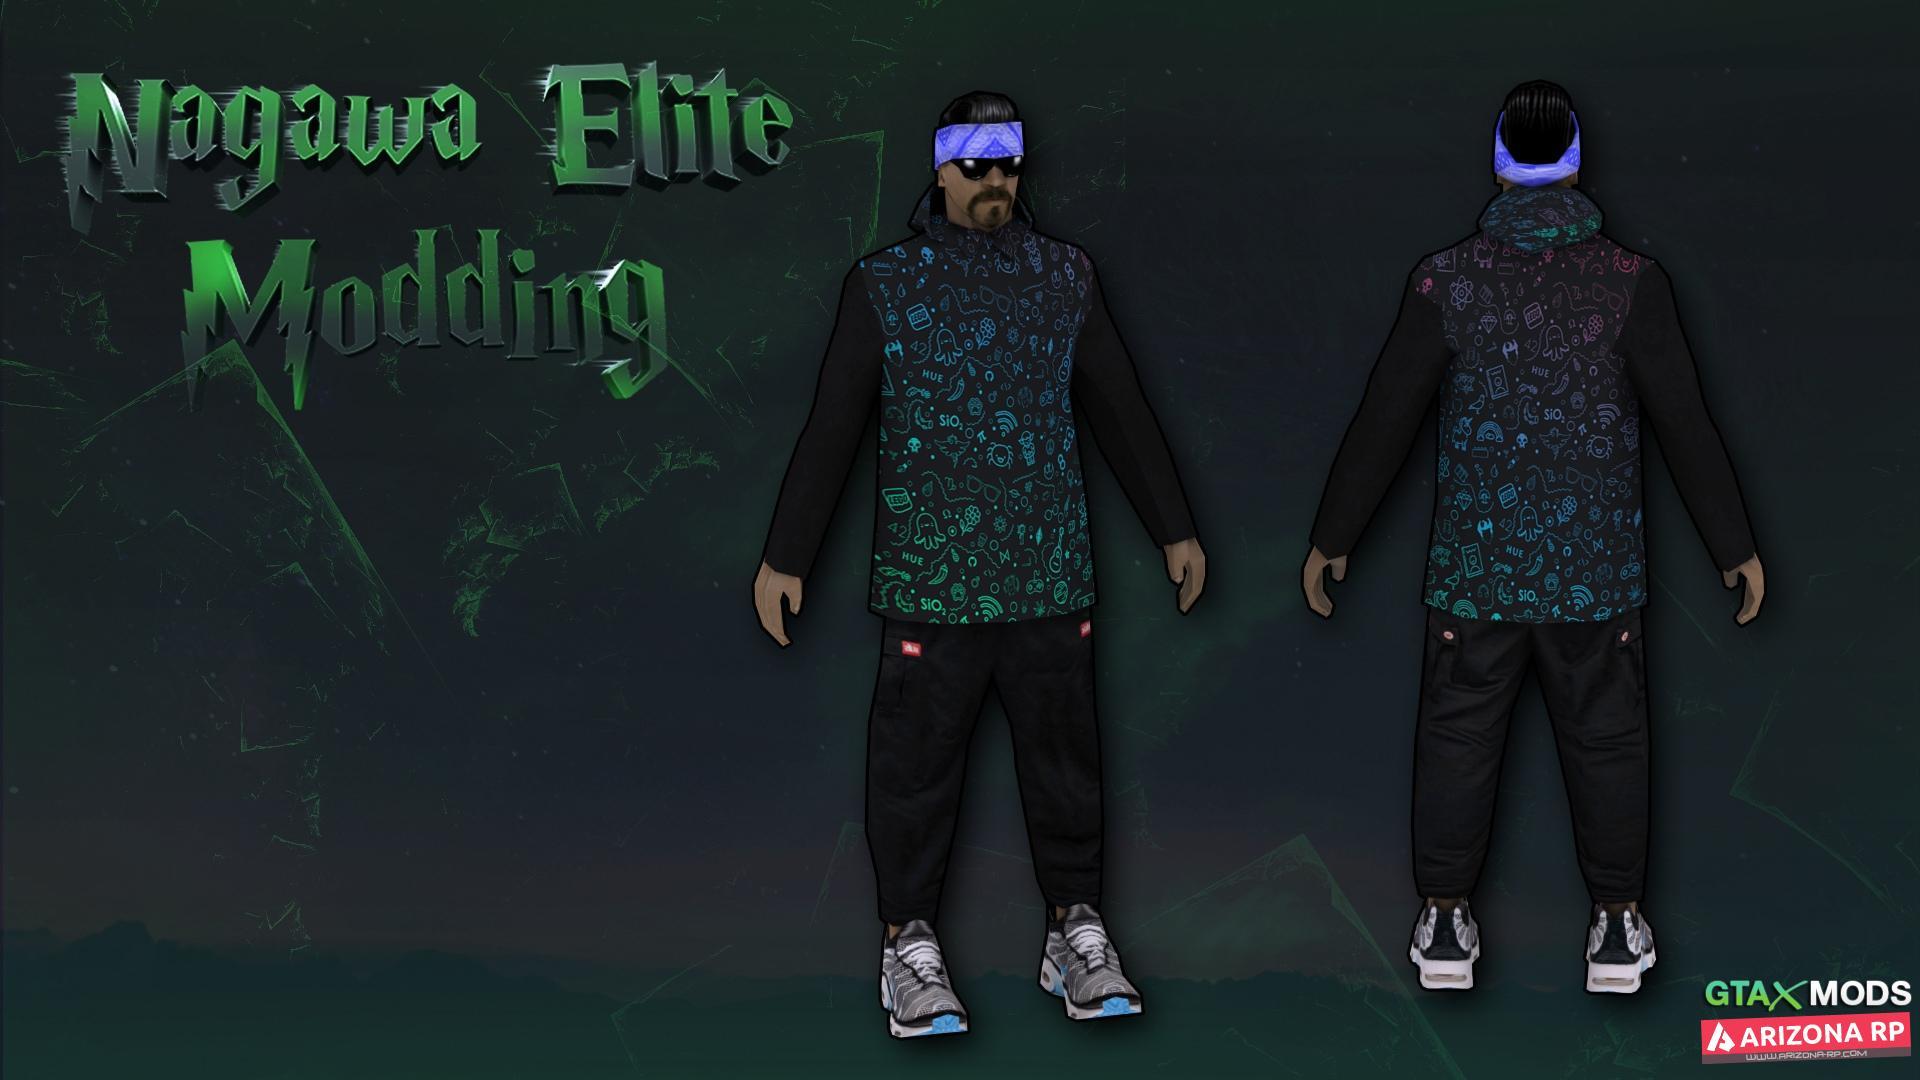 SFR1 | Nagawa Elite Modding